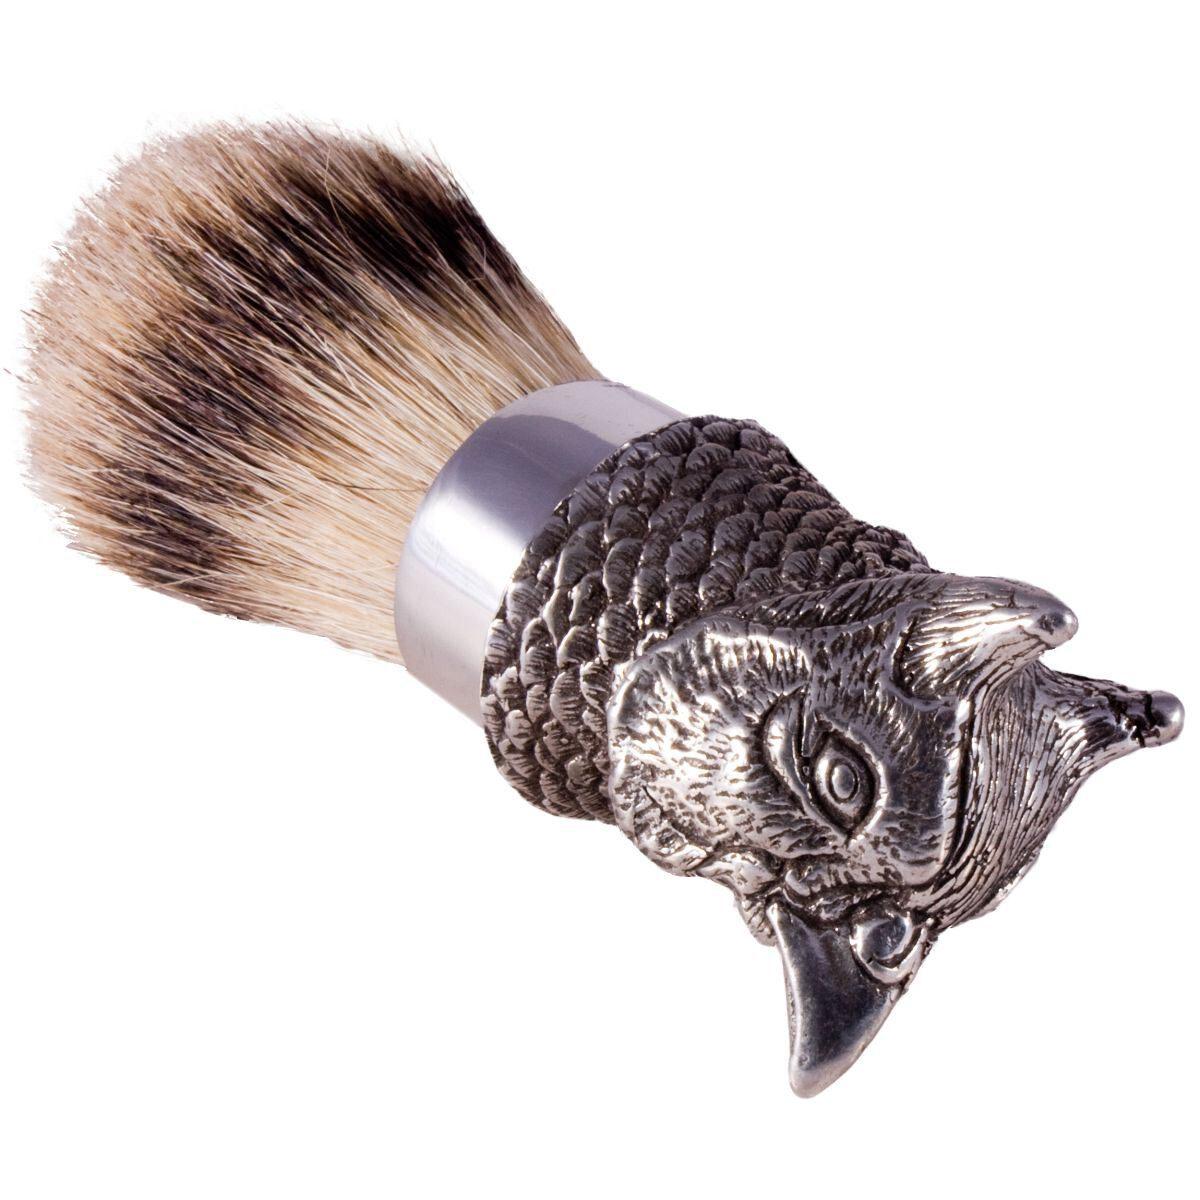 Silver tip shaving brush Pheasant